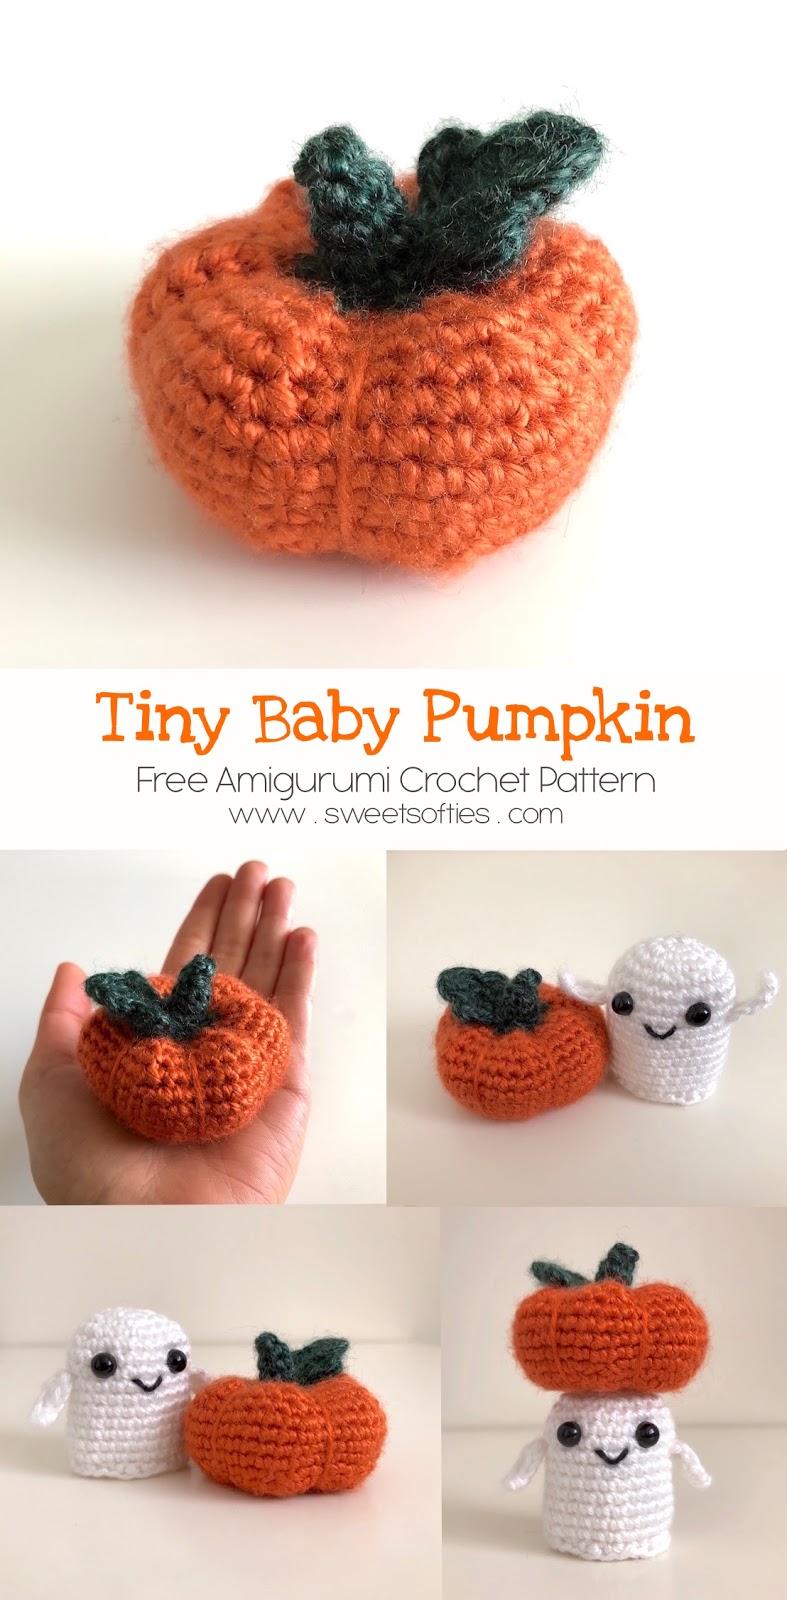 Tiny Baby Pumpkin Free Crochet Pattern Sweet Softies Amigurumi